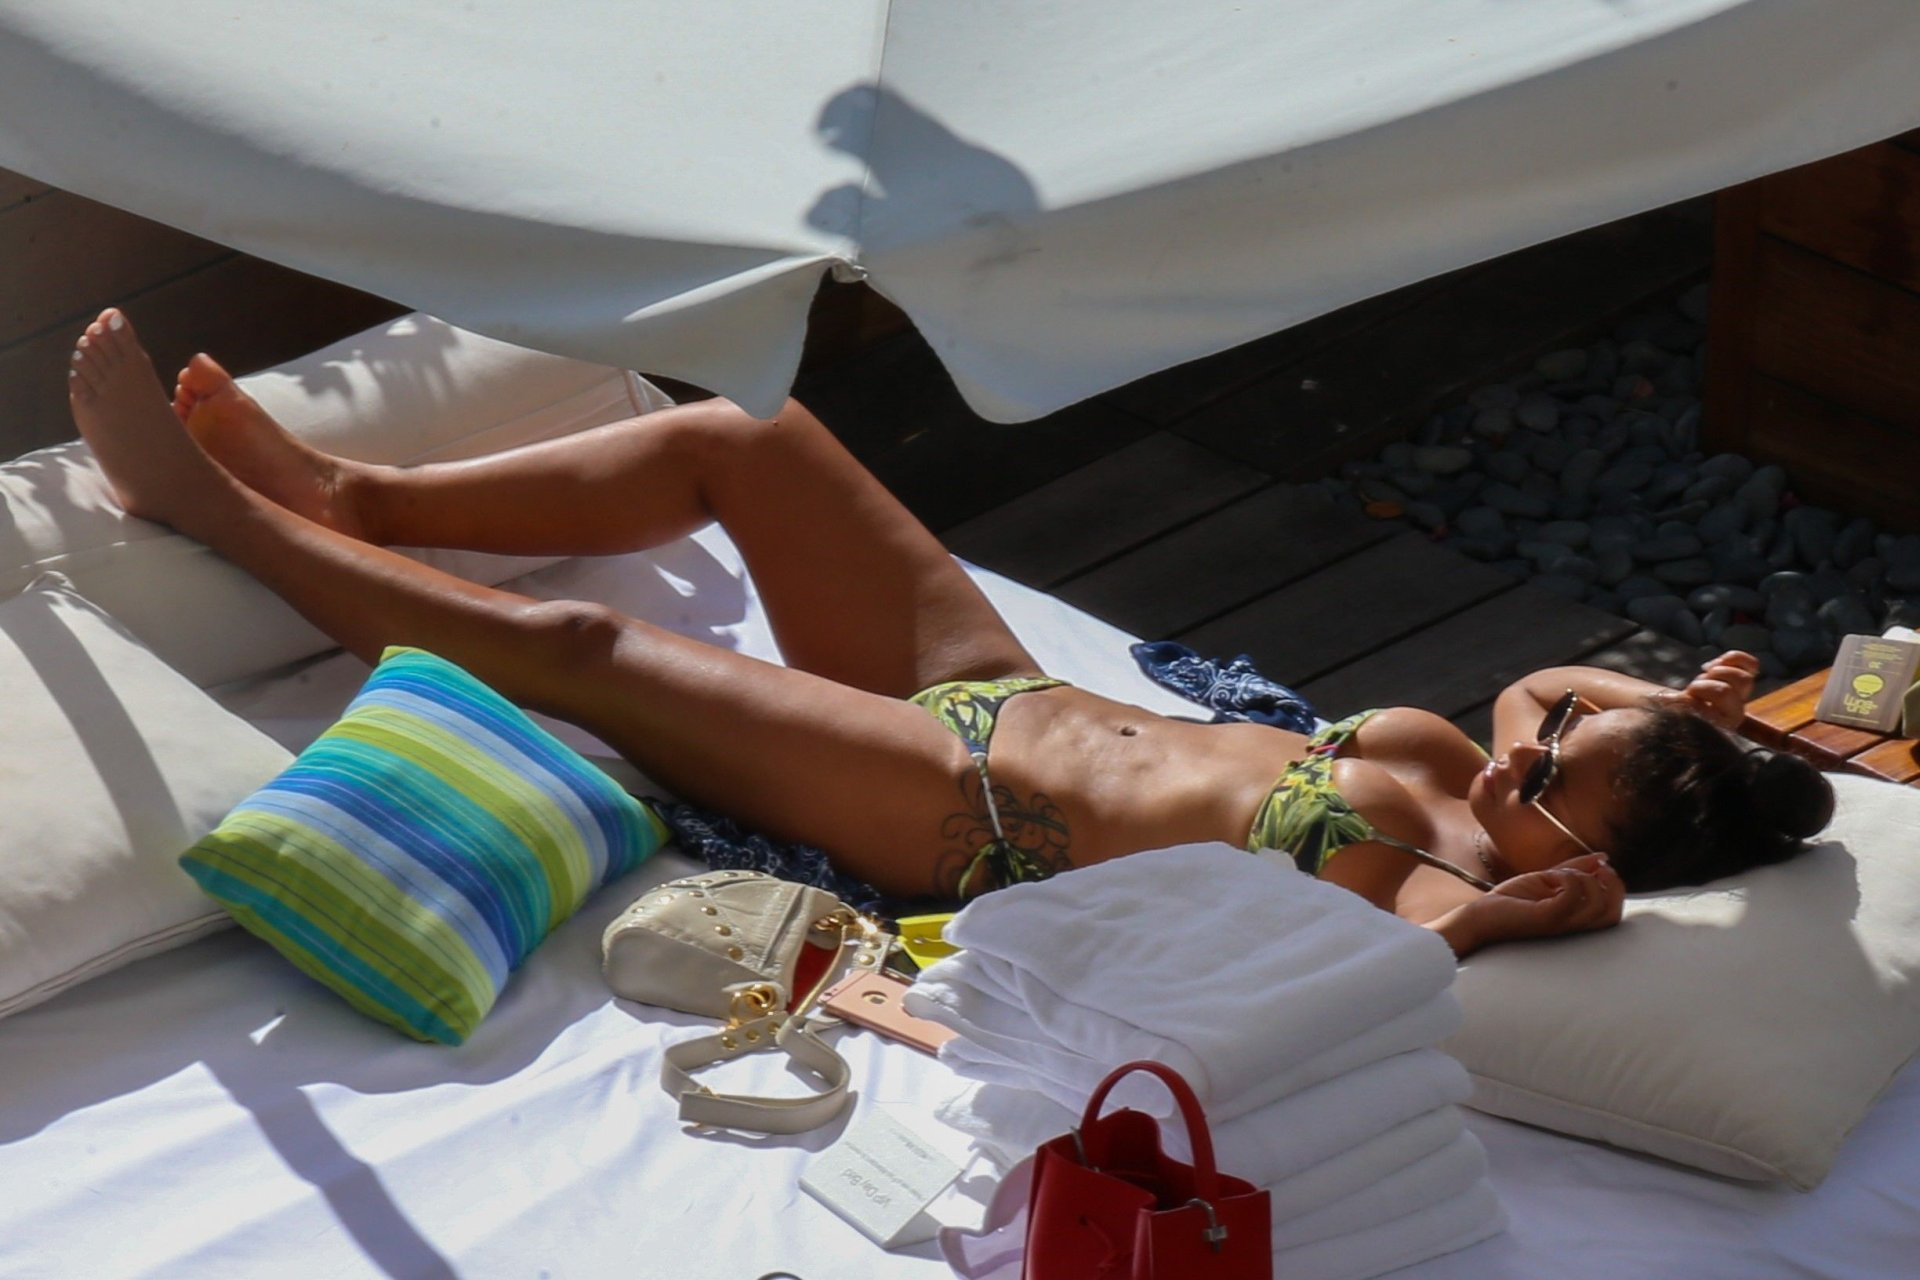 Emilia clarke got,Miroslava Karpovich Nude Photos and Videos Porn pics & movies Rosanna pansino sexy,Neve campbell mock lesbian again